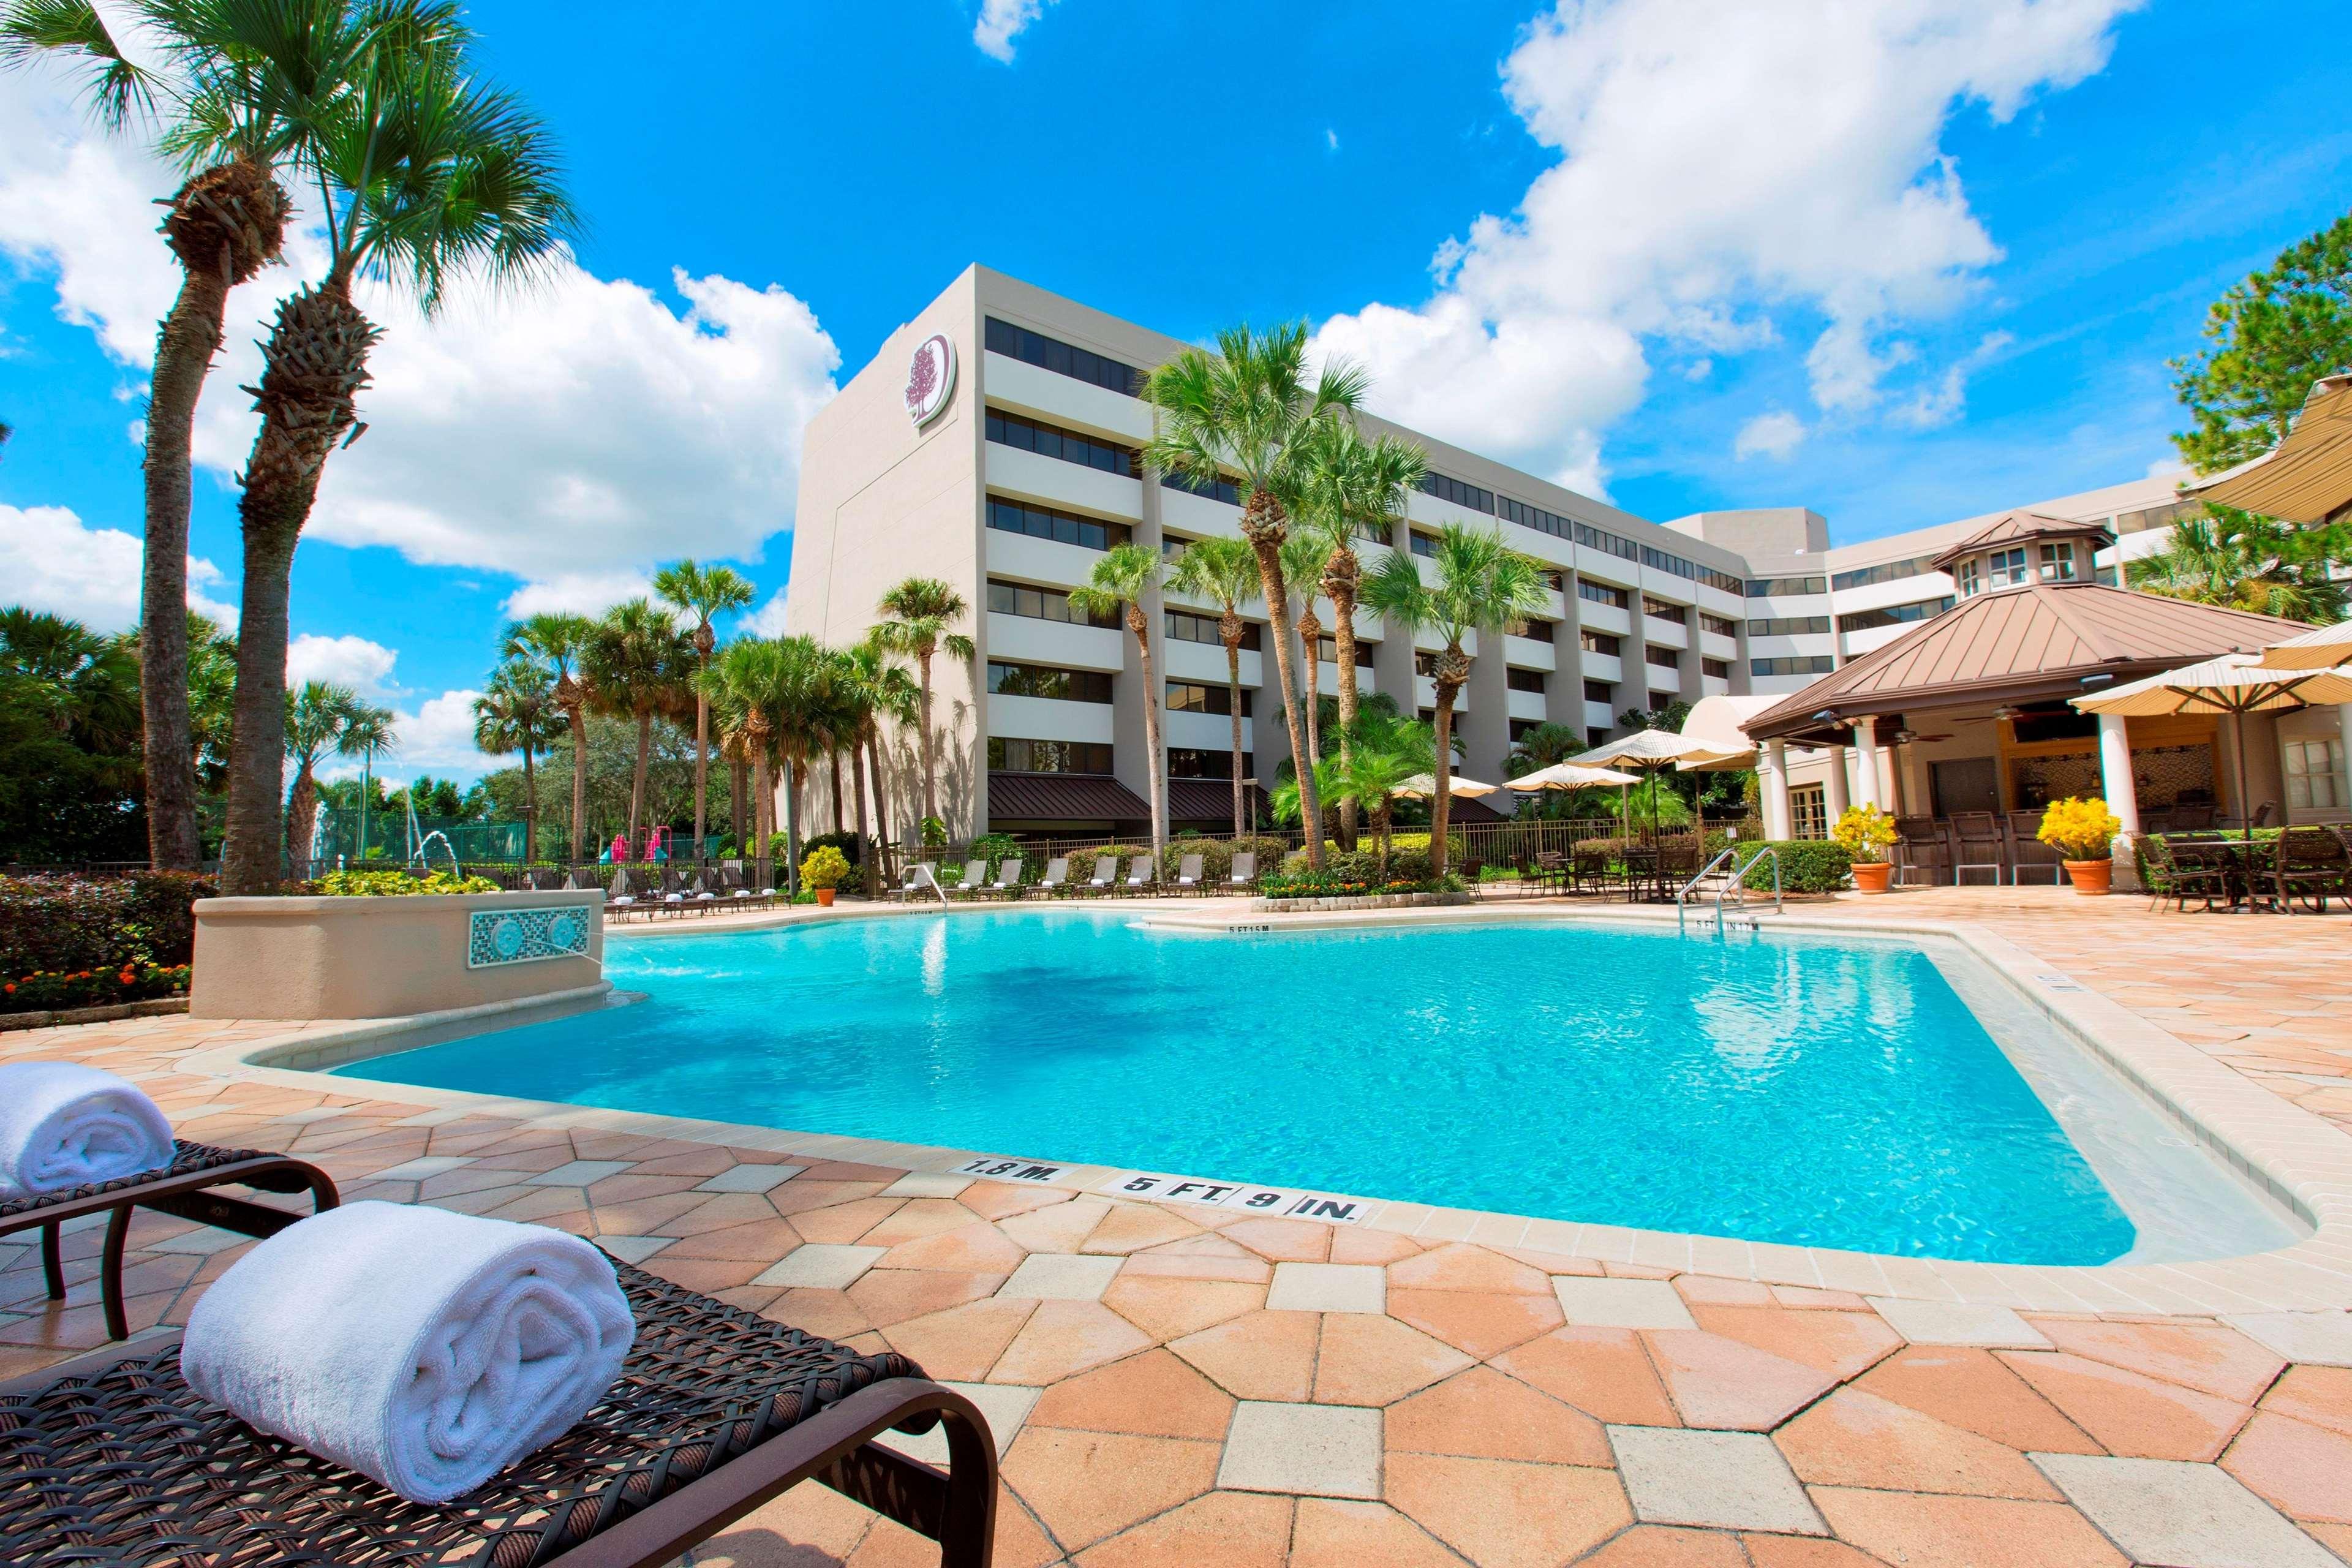 DoubleTree Suites by Hilton Orlando - Disney Springs Area image 2